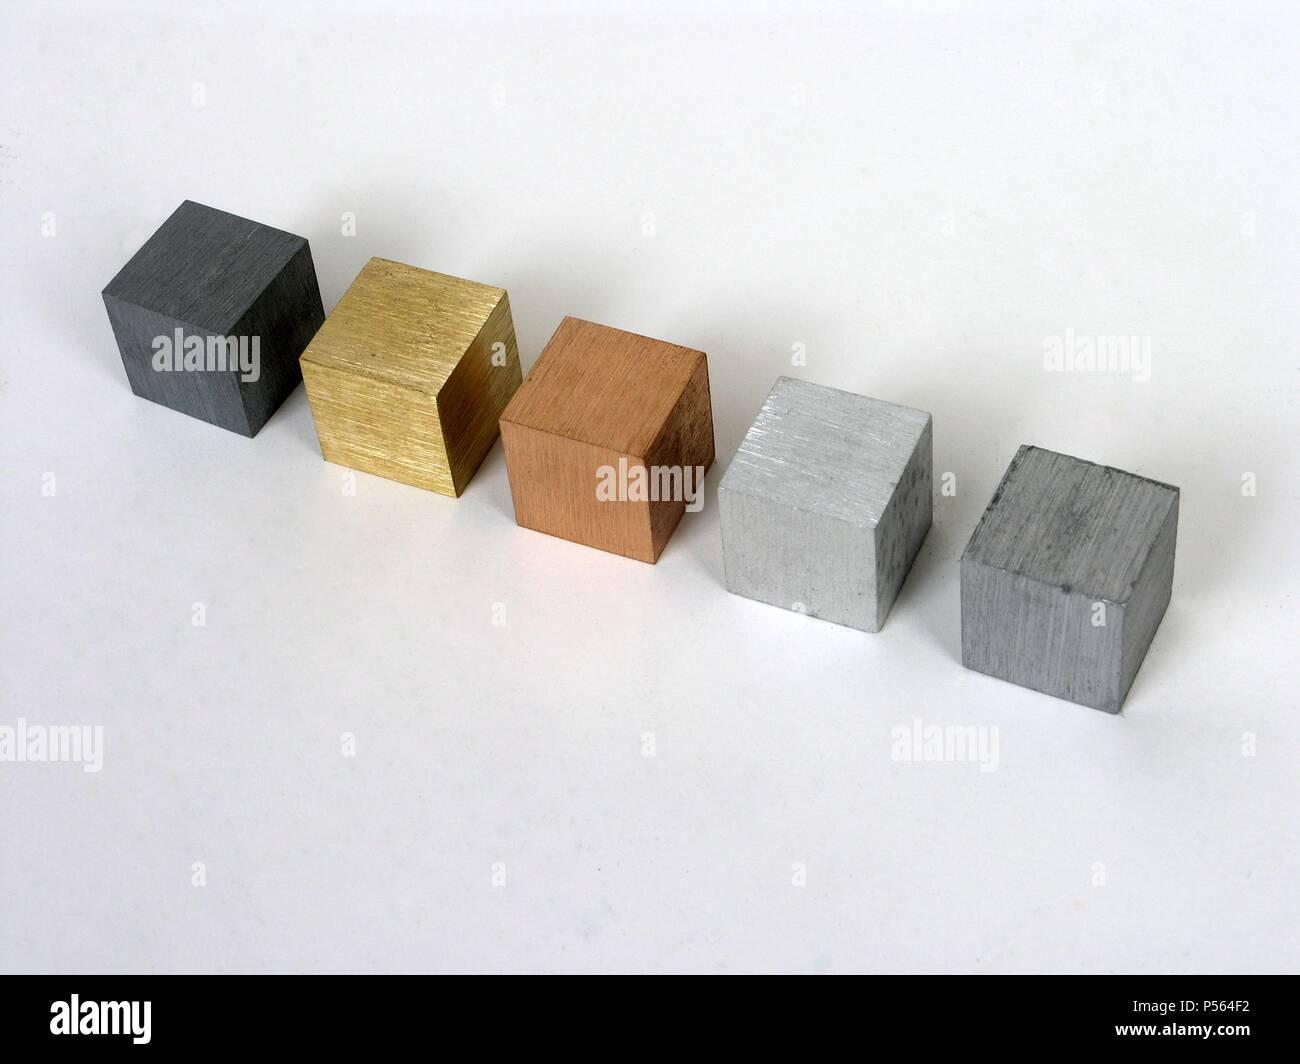 Laton stock photos laton stock images alamy - Hierro y aluminio ...